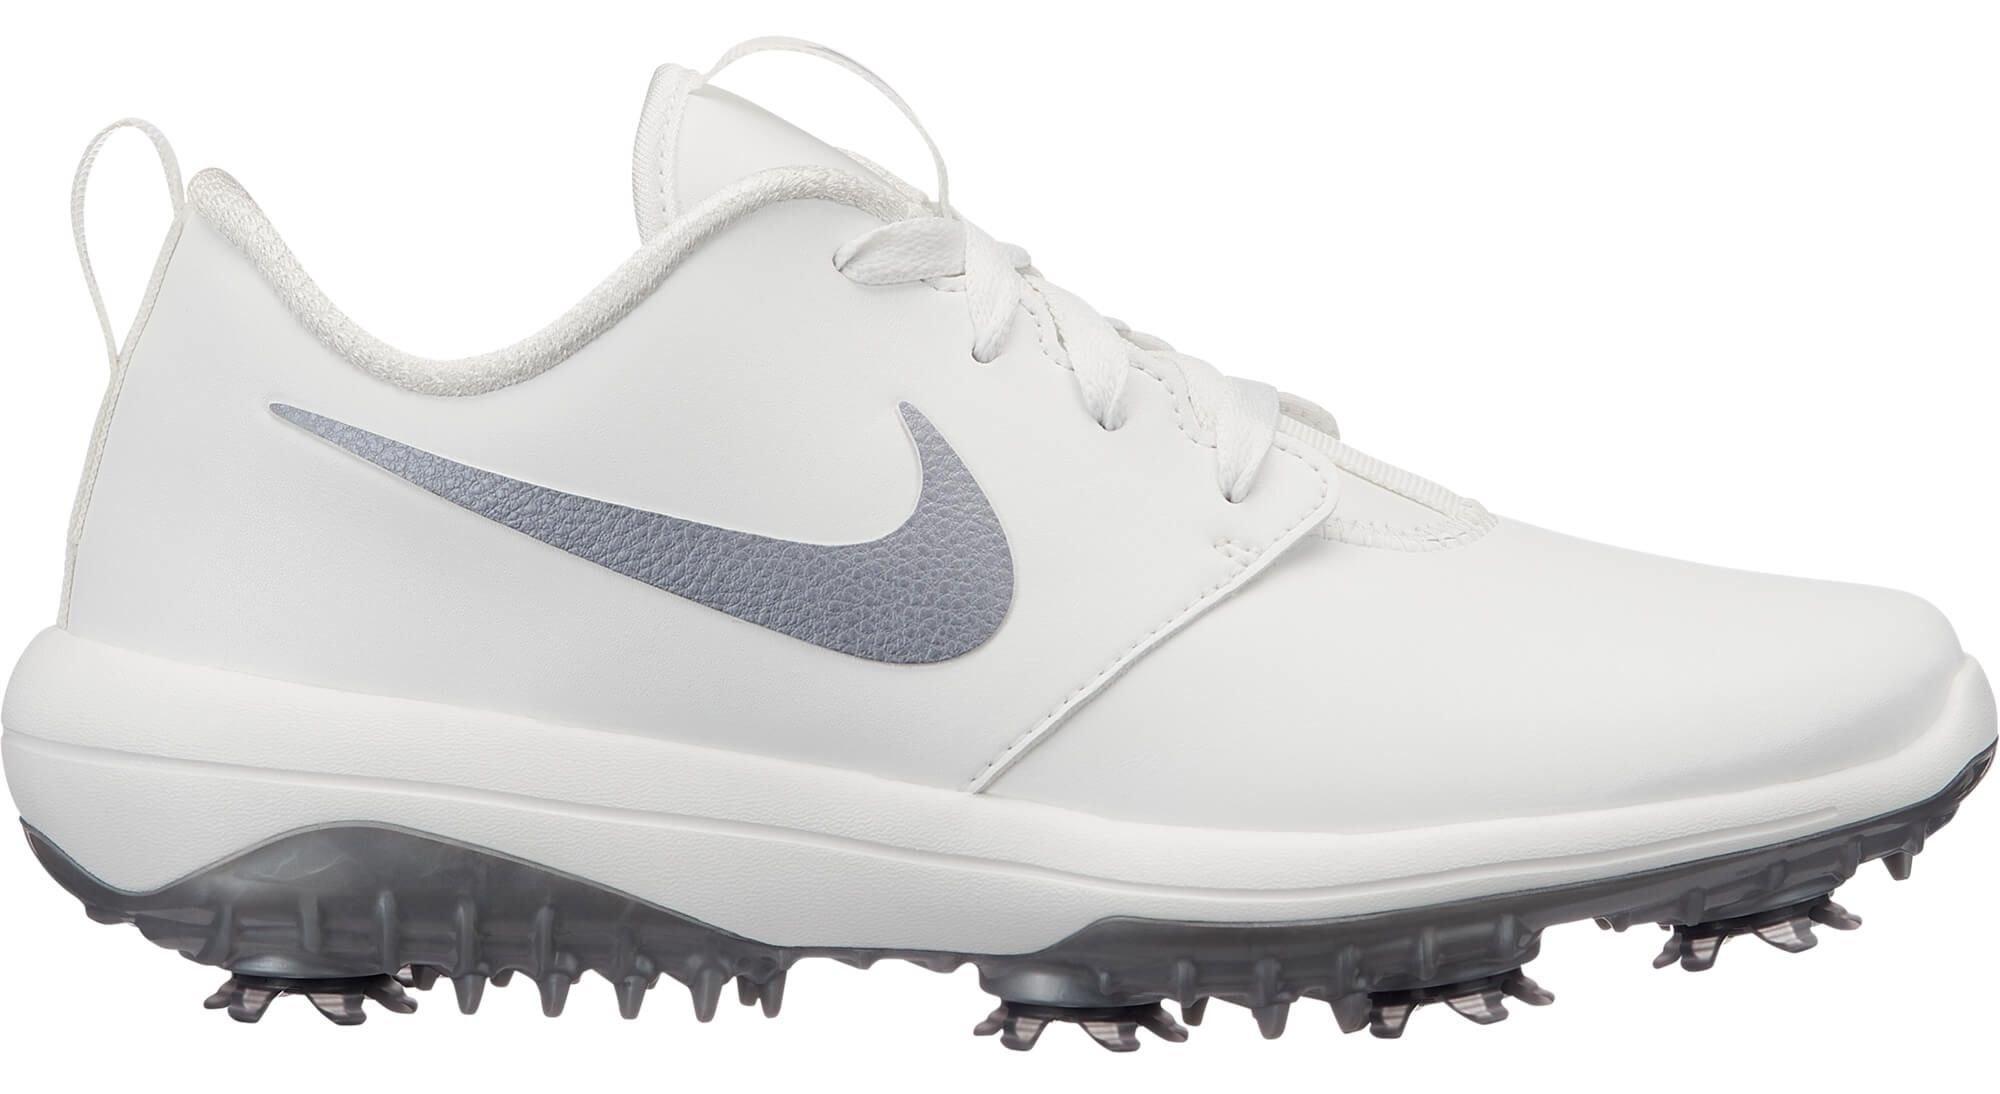 Nike Womens Roshe G Tour Golf Shoes